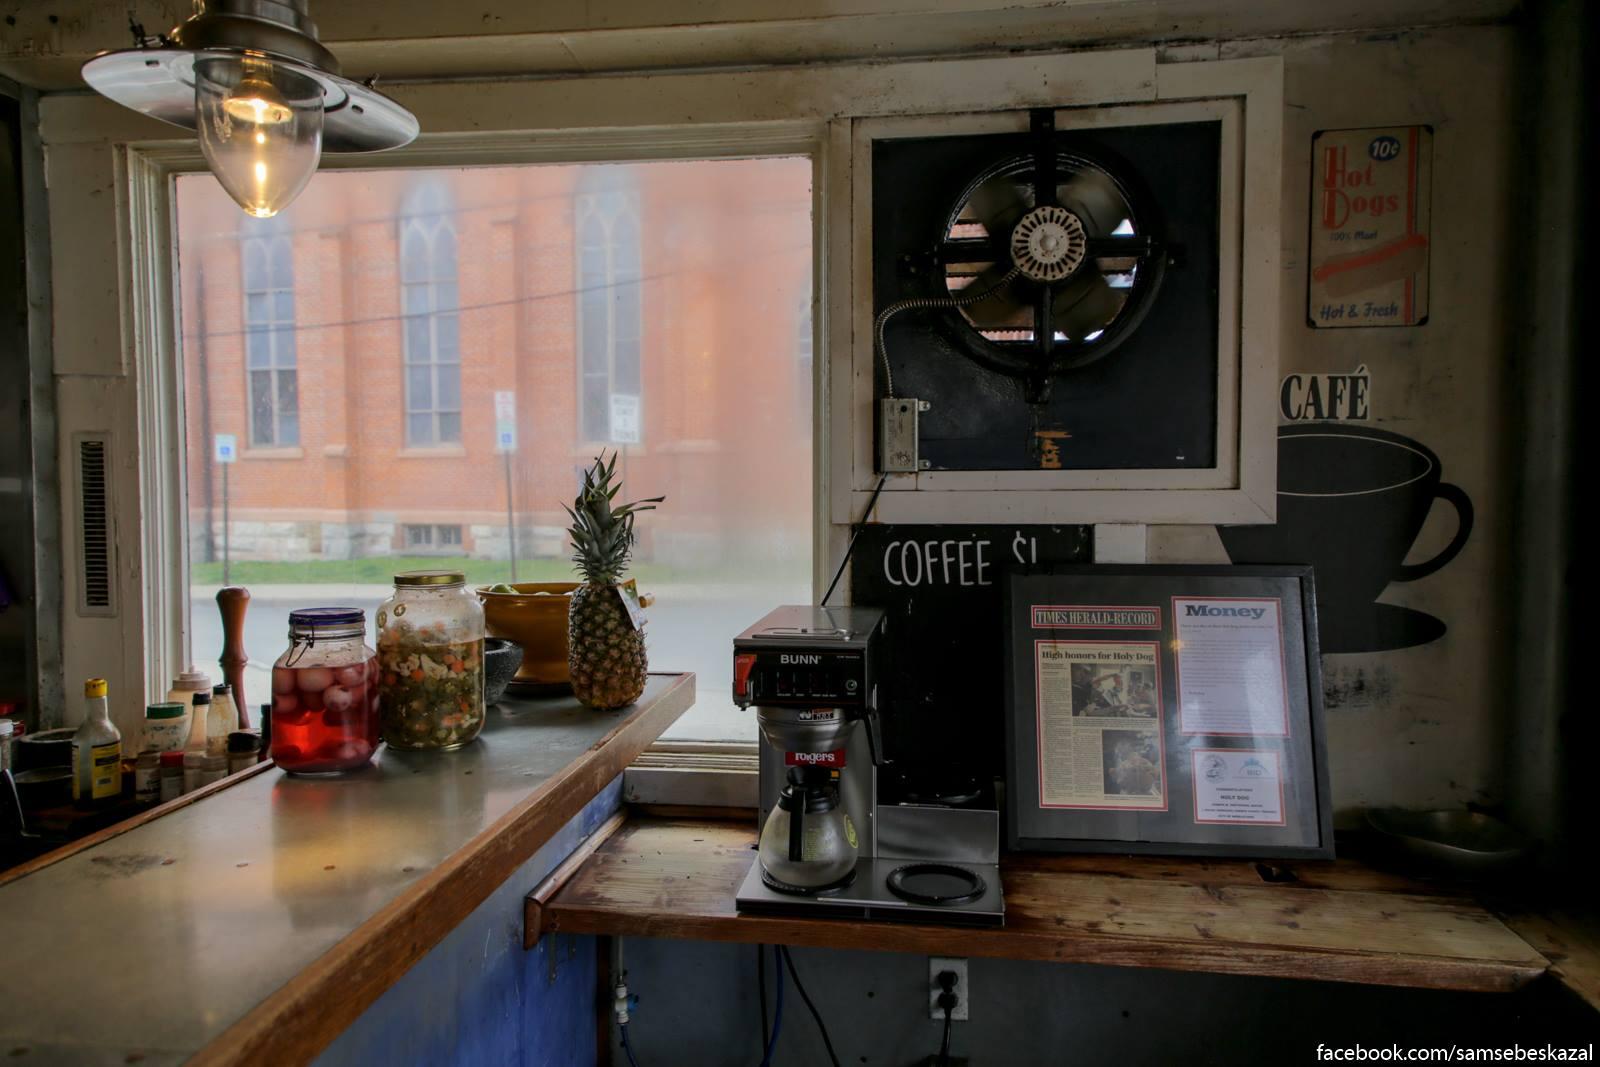 Kofe a tam zakazyvatʹ ne stal :) Na stojke banka s marinovannymi ajcami. Nikogda ih ne proboval.